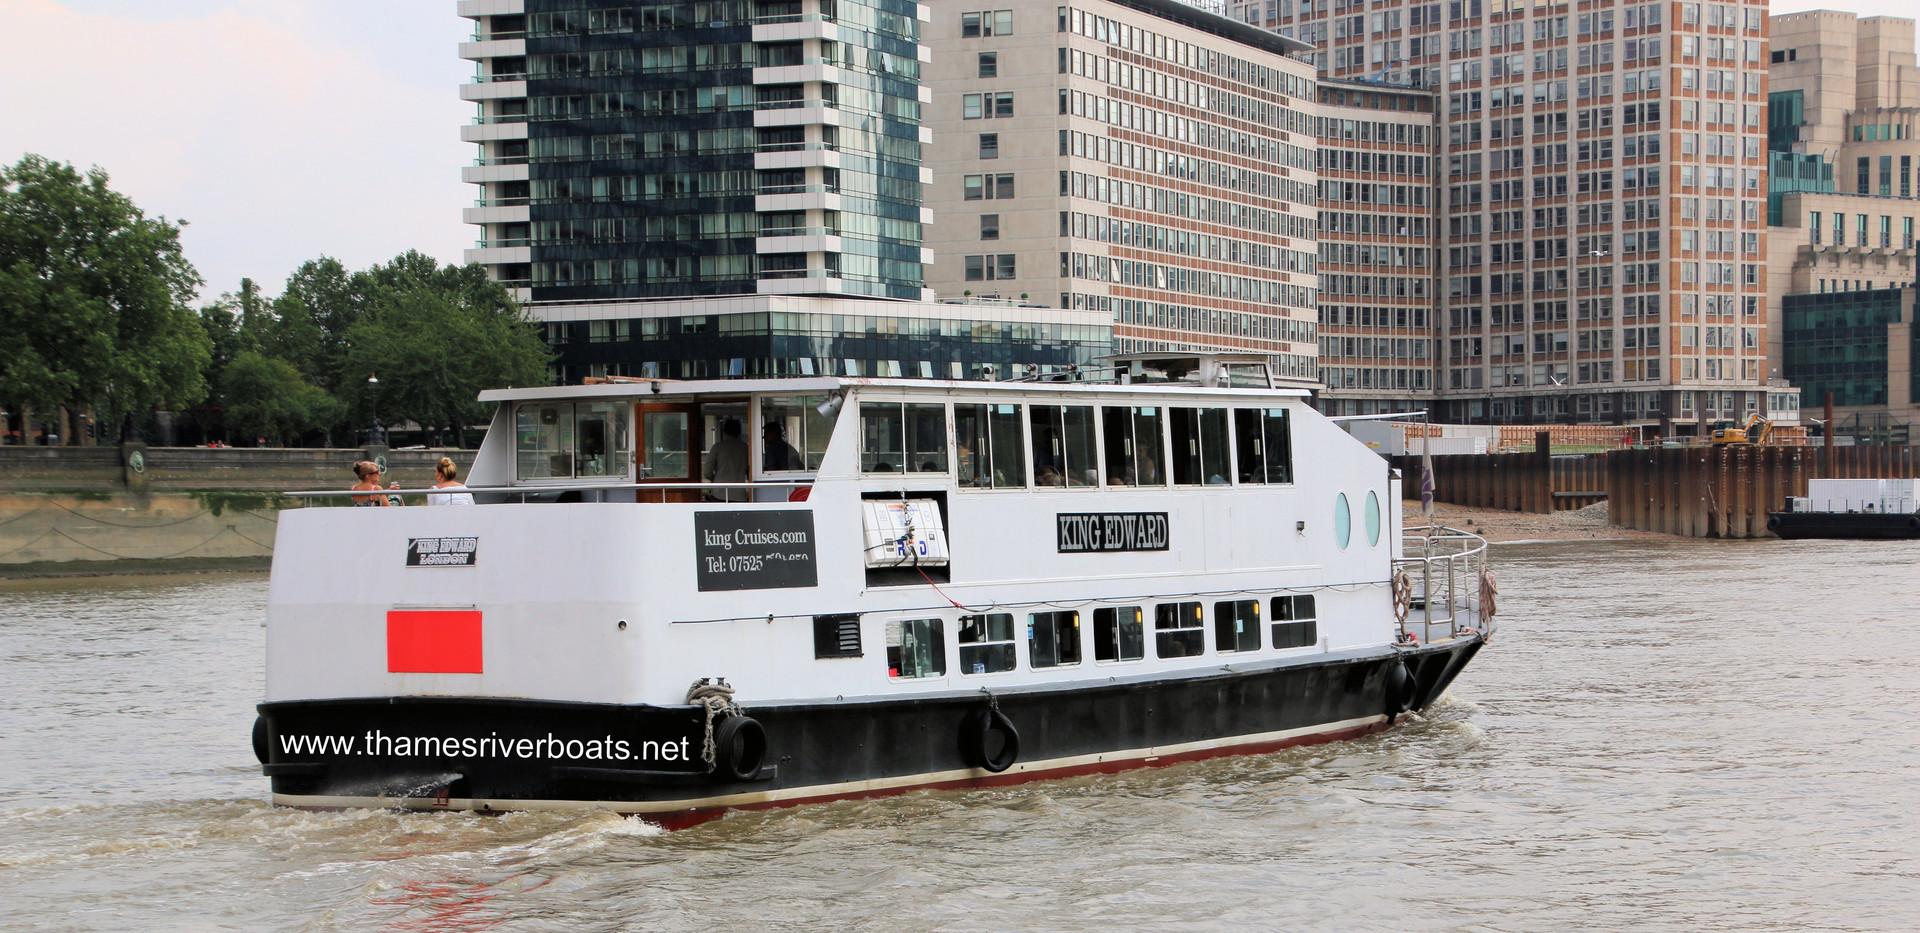 King Edward Thames River Boat for Hire